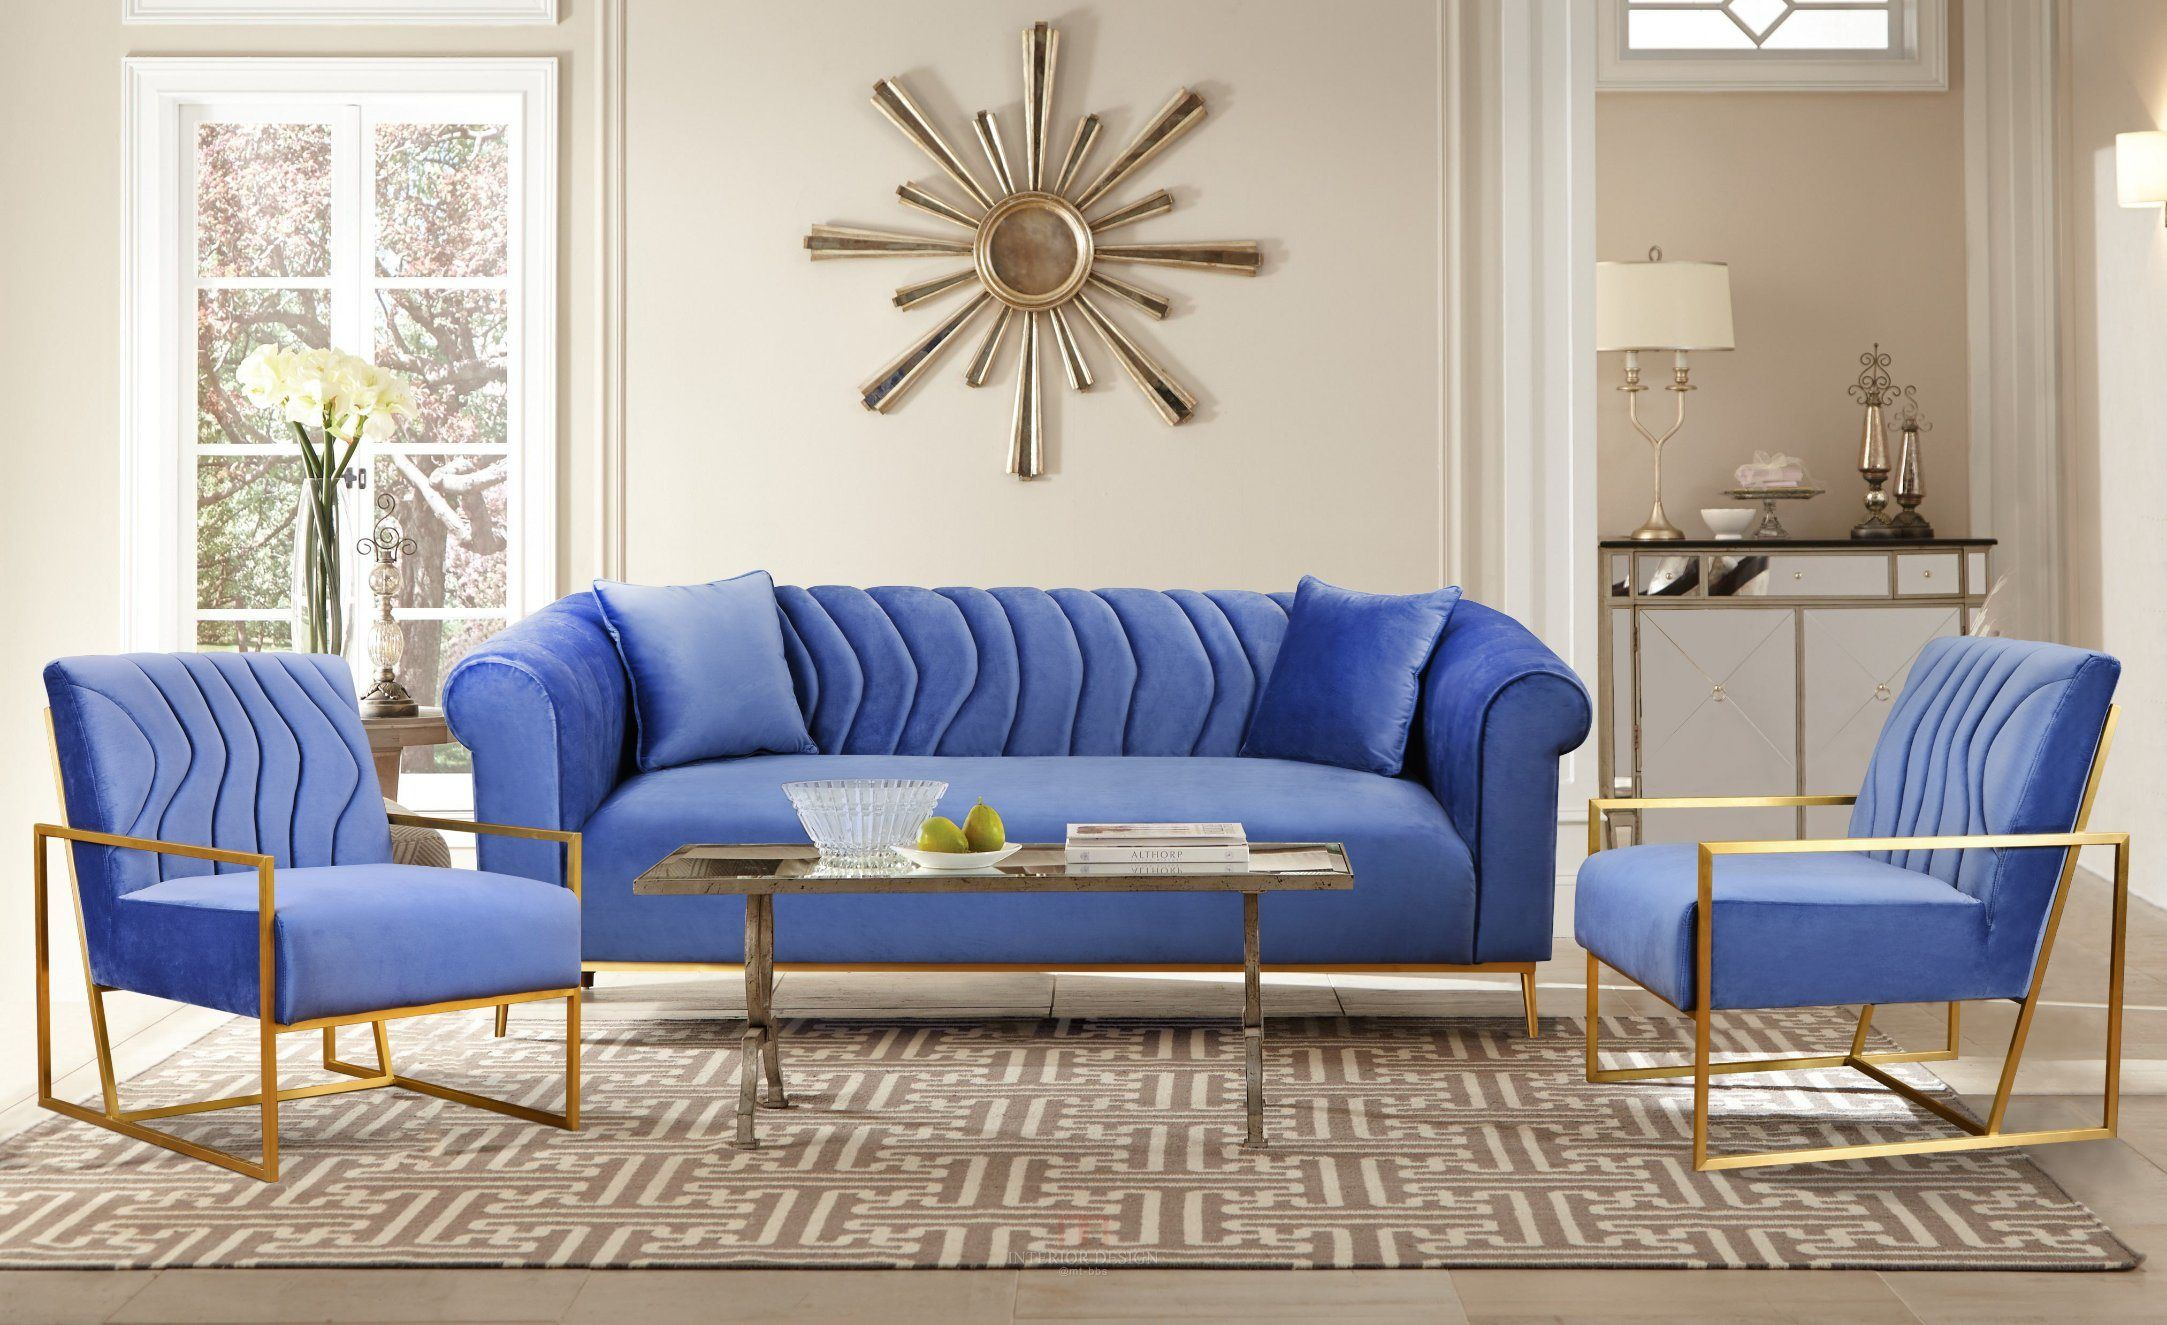 10+ Stunning Wholesale Living Room Sets